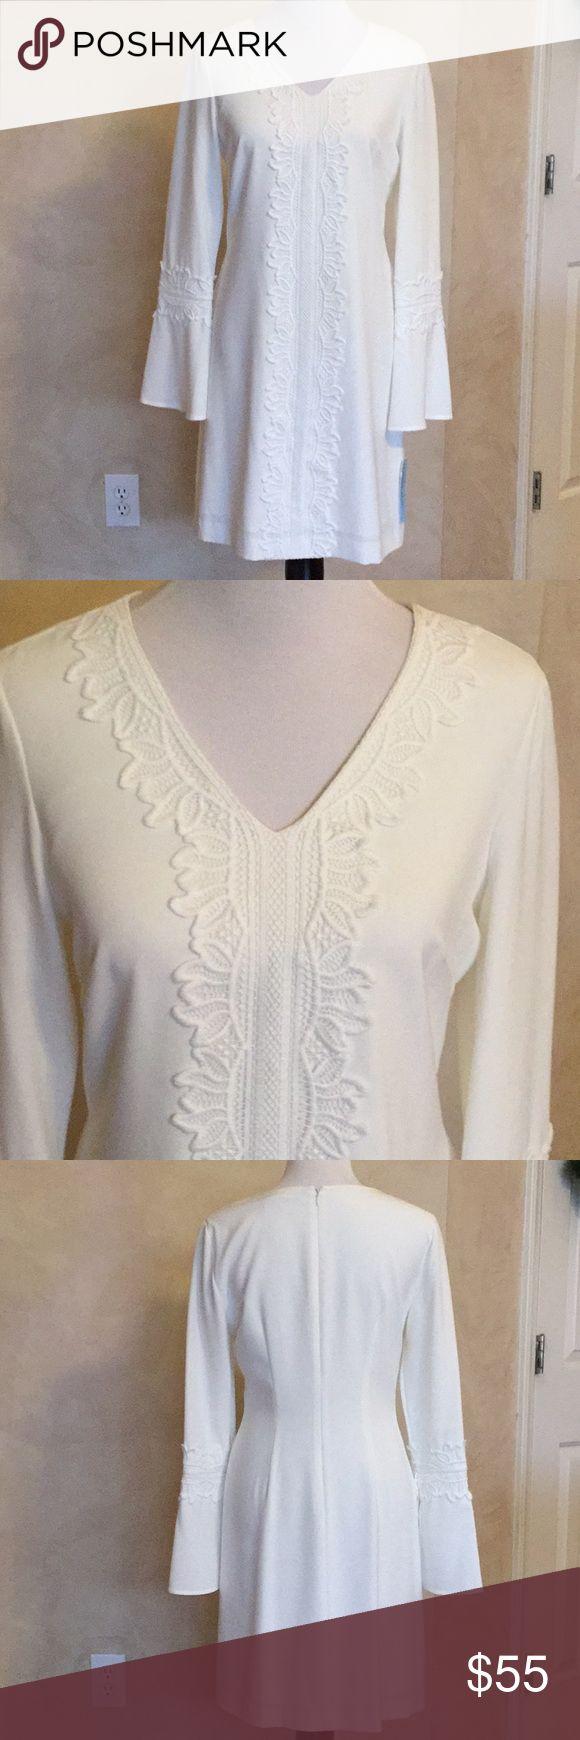 "Antonio Melani Dress Antonio Melani Dress - New with Tags. Zipper in back. Length is 36"". ANTONIO MELANI Dresses"